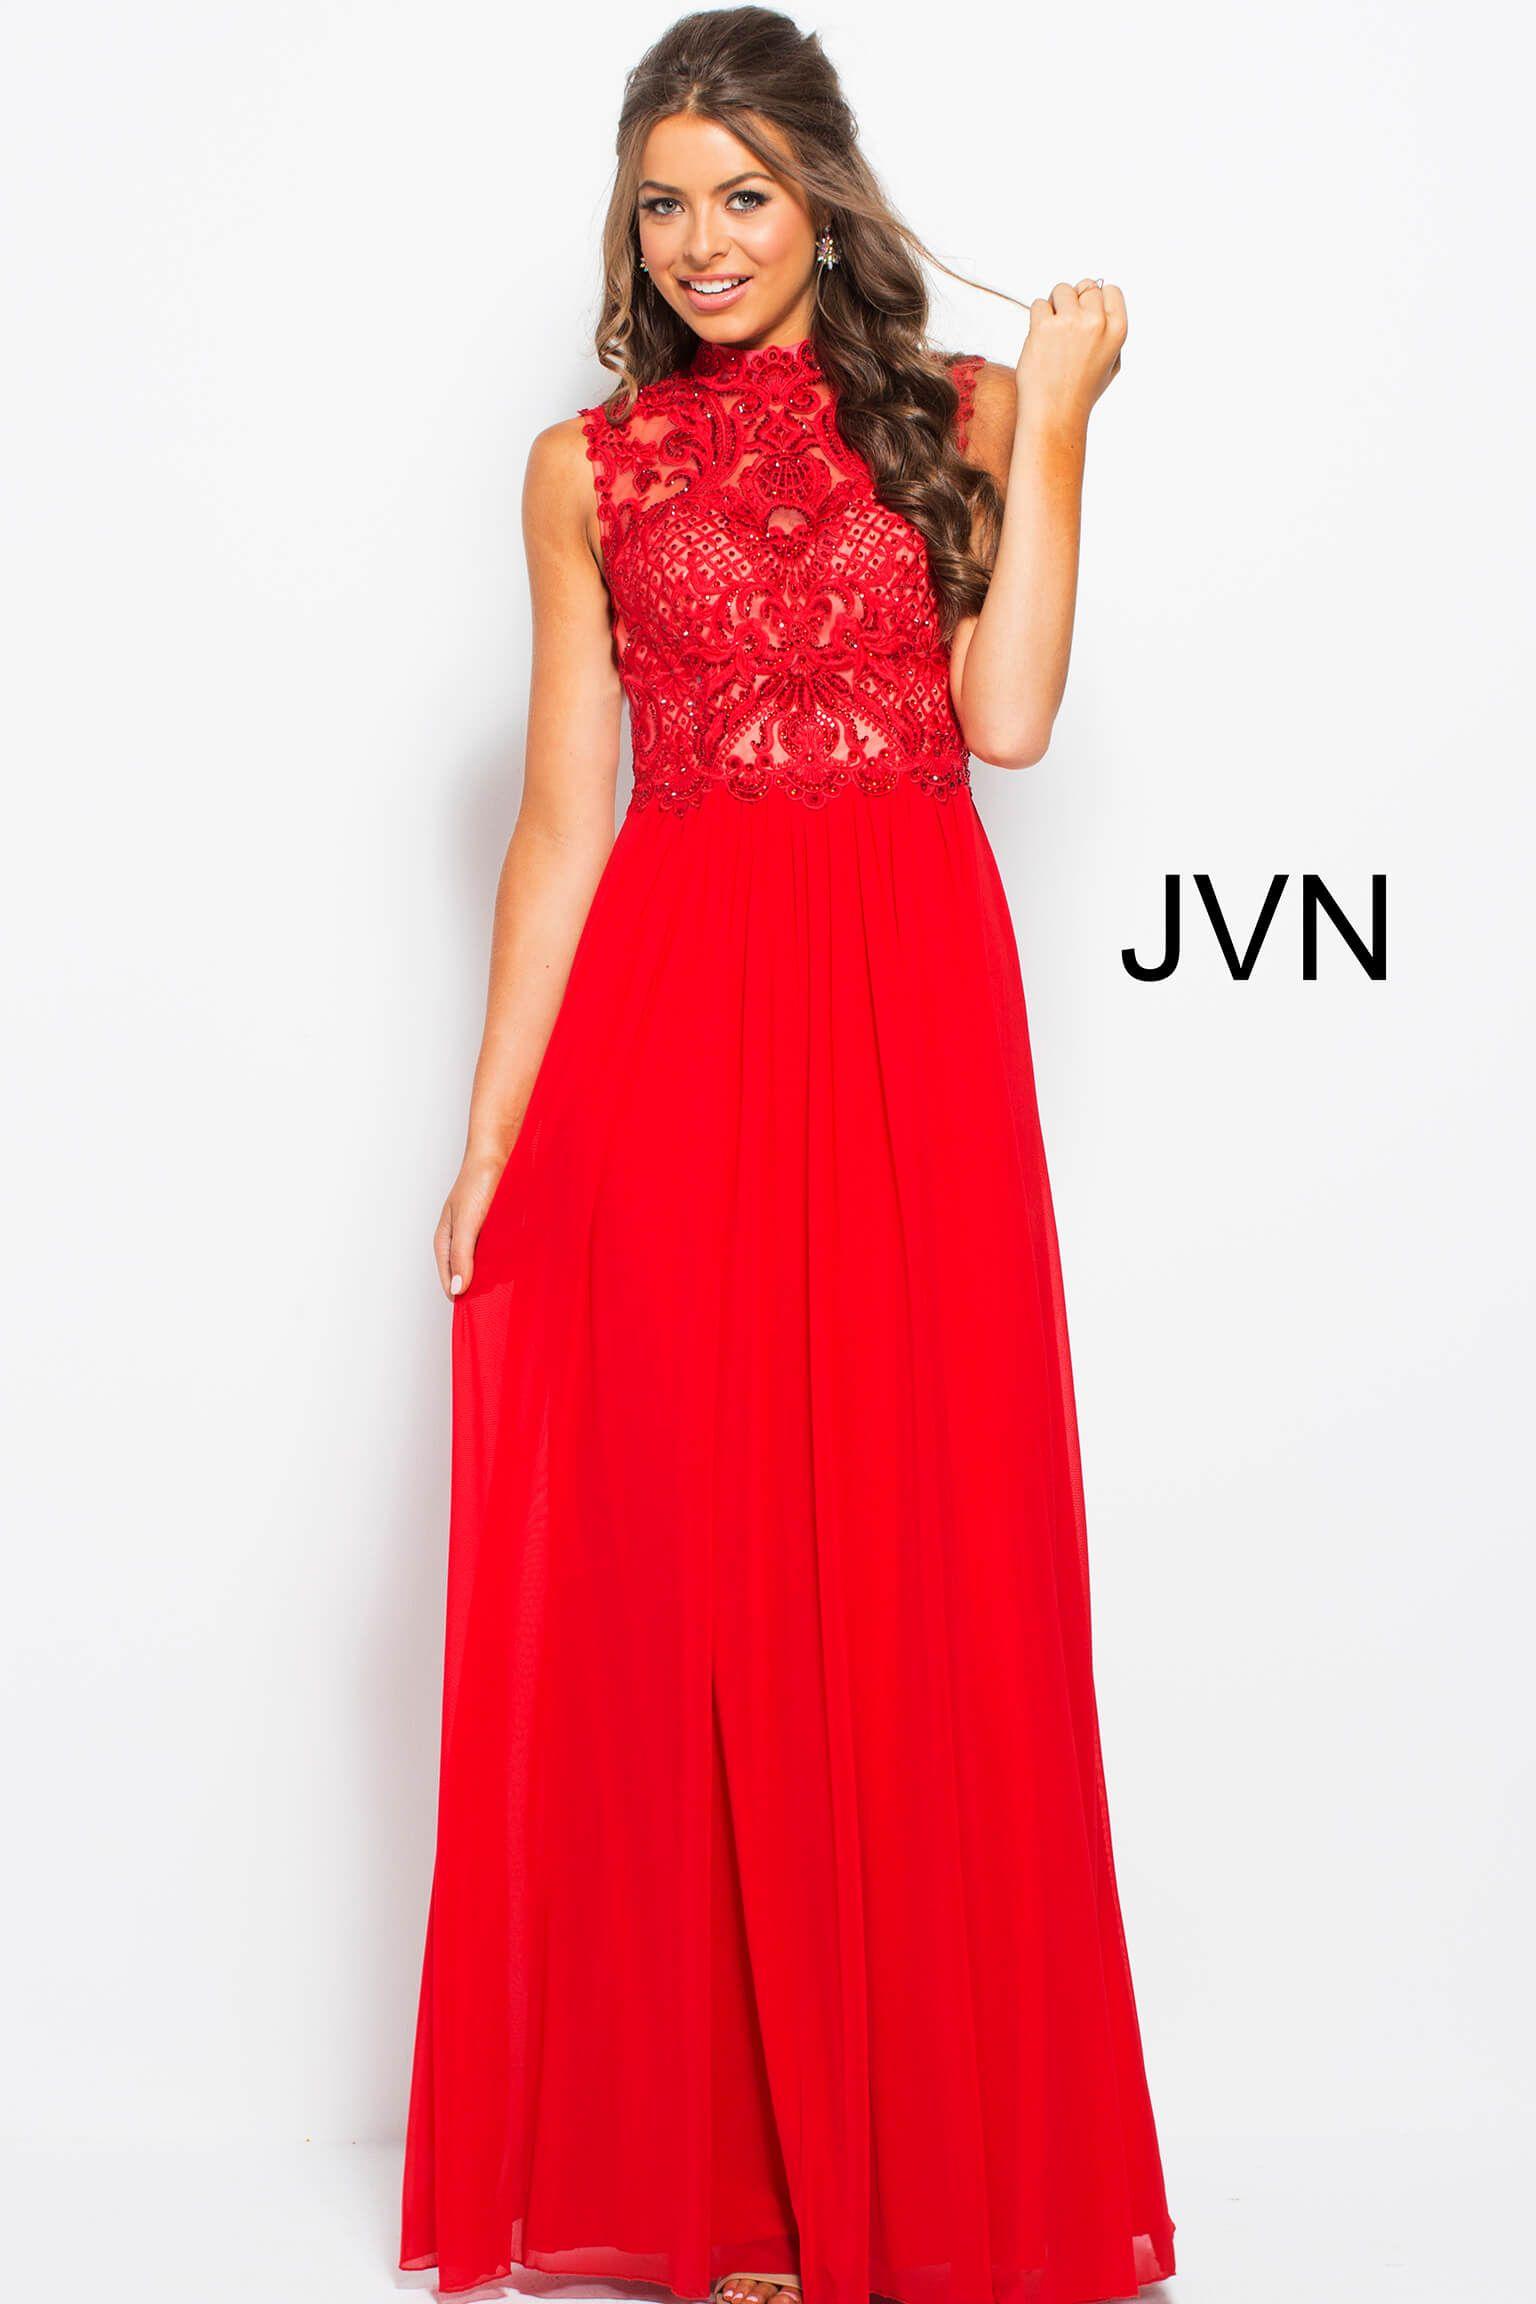 Jvn By Jovani Jvn55872 International Prom Association Dresses Prom Dresses Sleeveless Homecoming Formal Dresses [ 2304 x 1536 Pixel ]